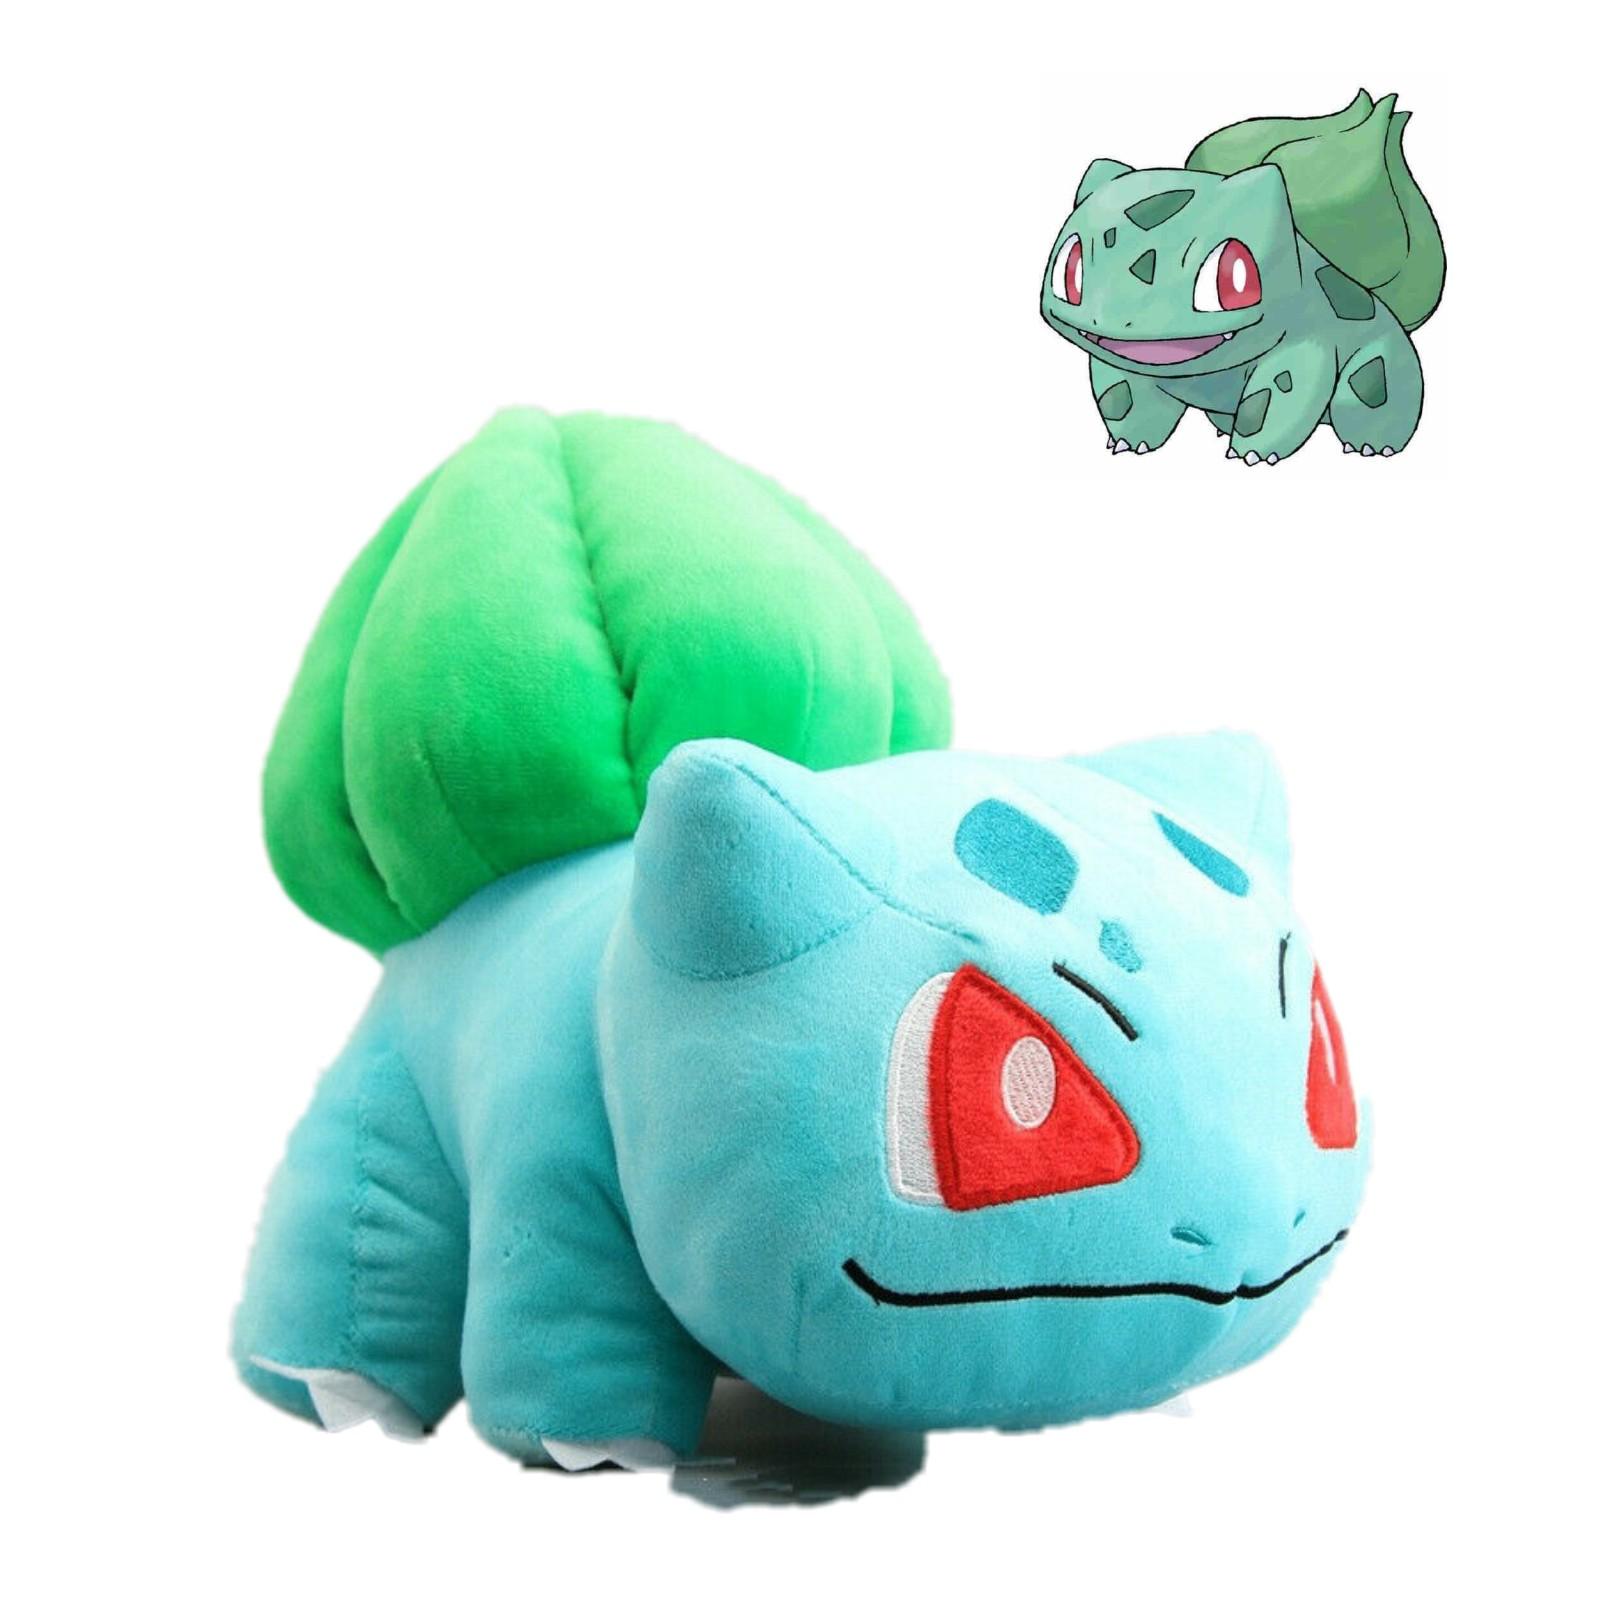 30cm Big Pokemon Bulbasaur Plush Toy Soft Stuffed Animal Doll Teddy Xmas Gift UK